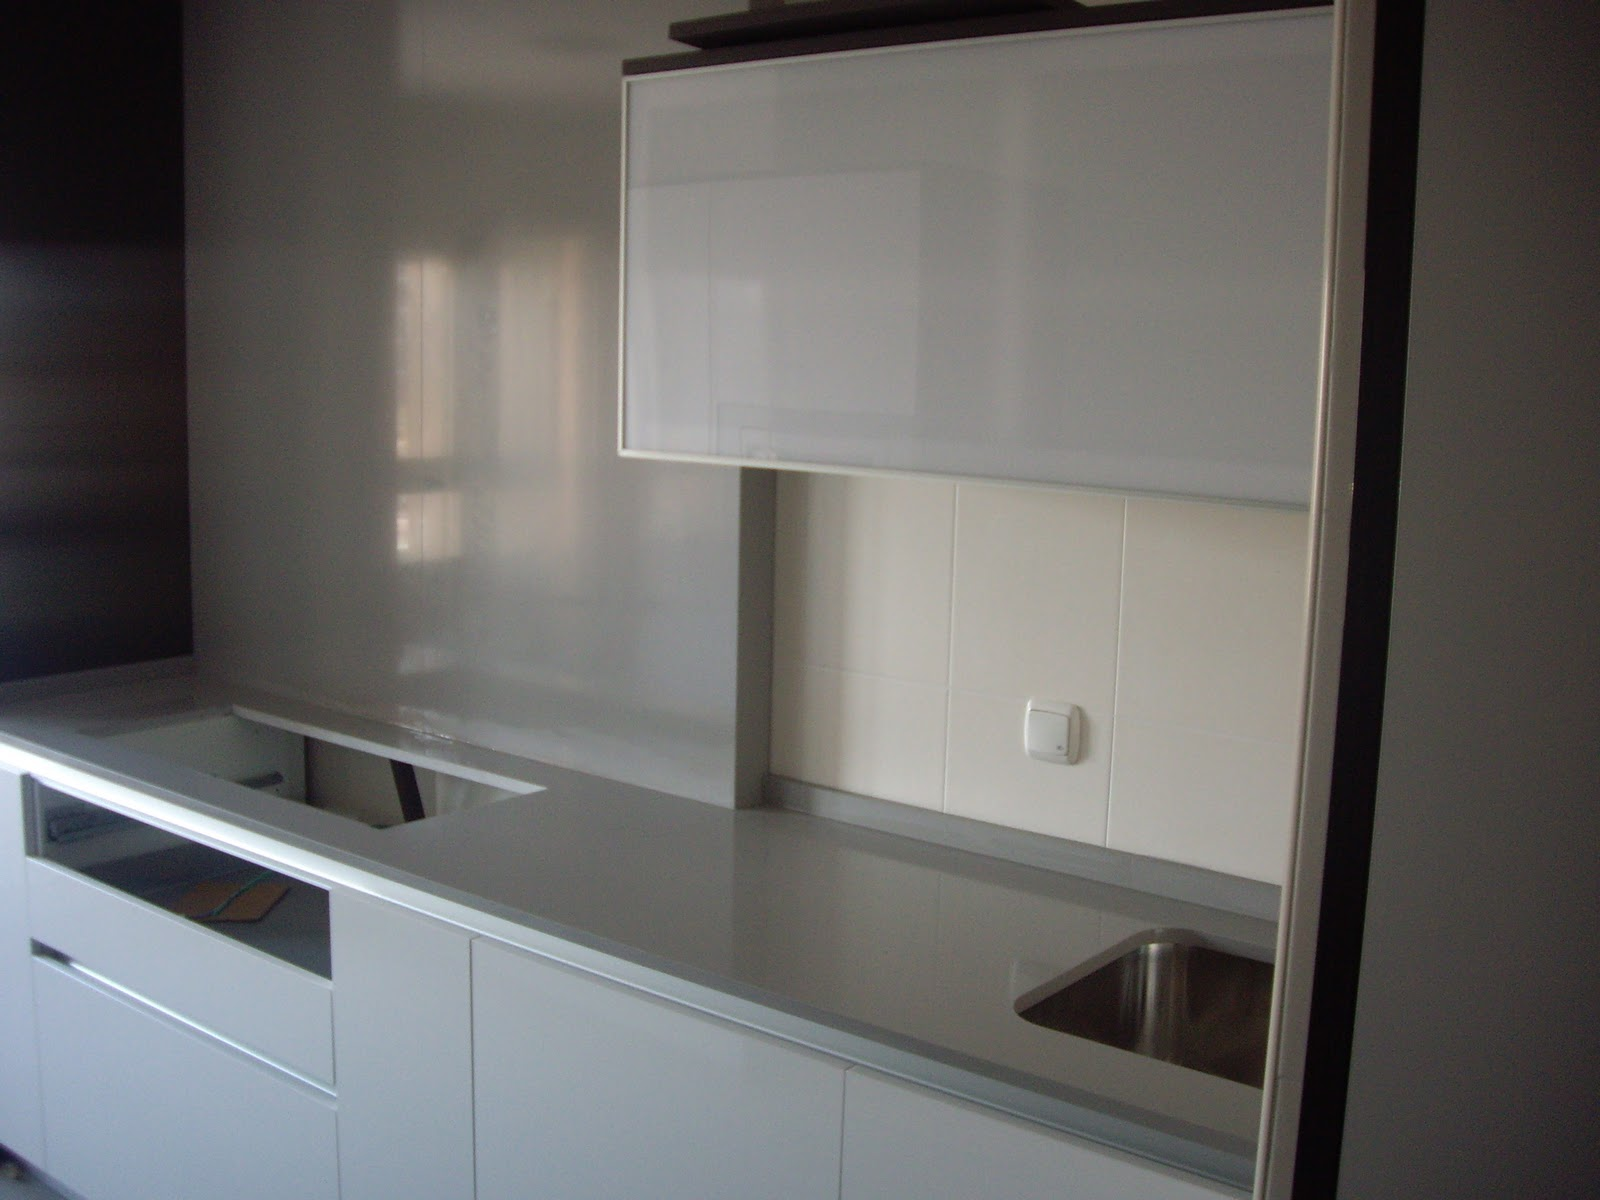 Elecci n silestone cocina gola decorar tu casa es - Cocinas con silestone ...